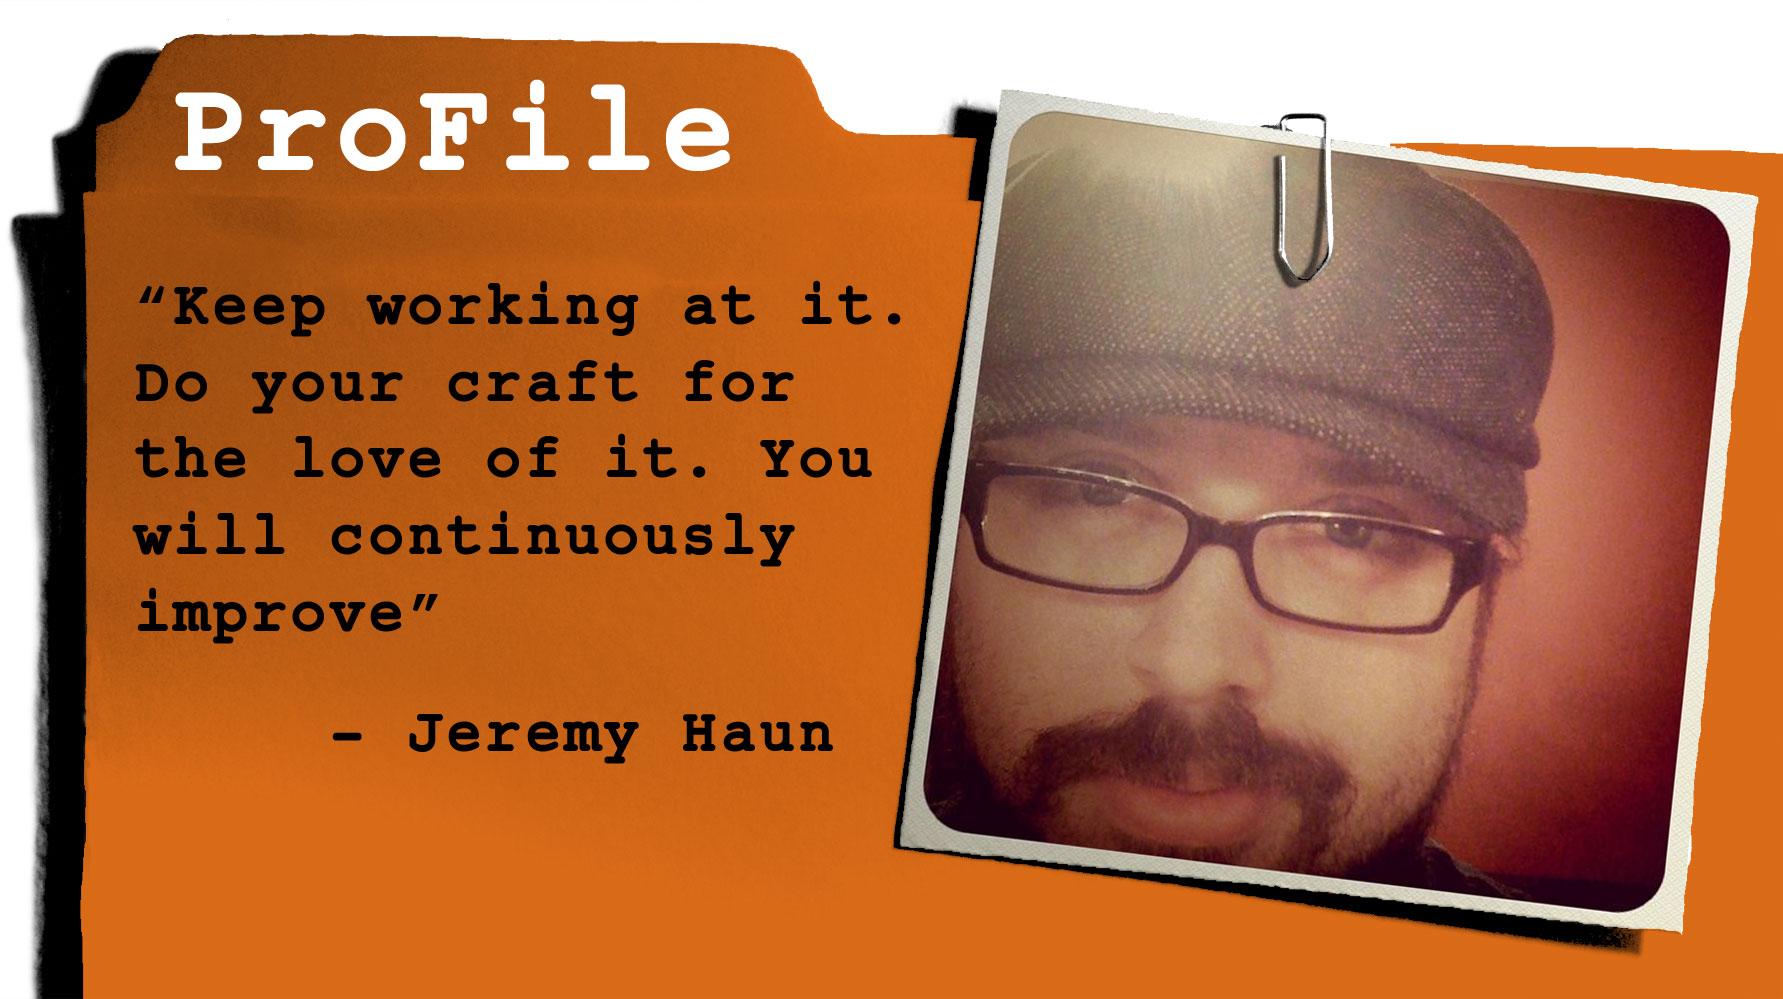 ProFile-Scott-Jeremy-Haun